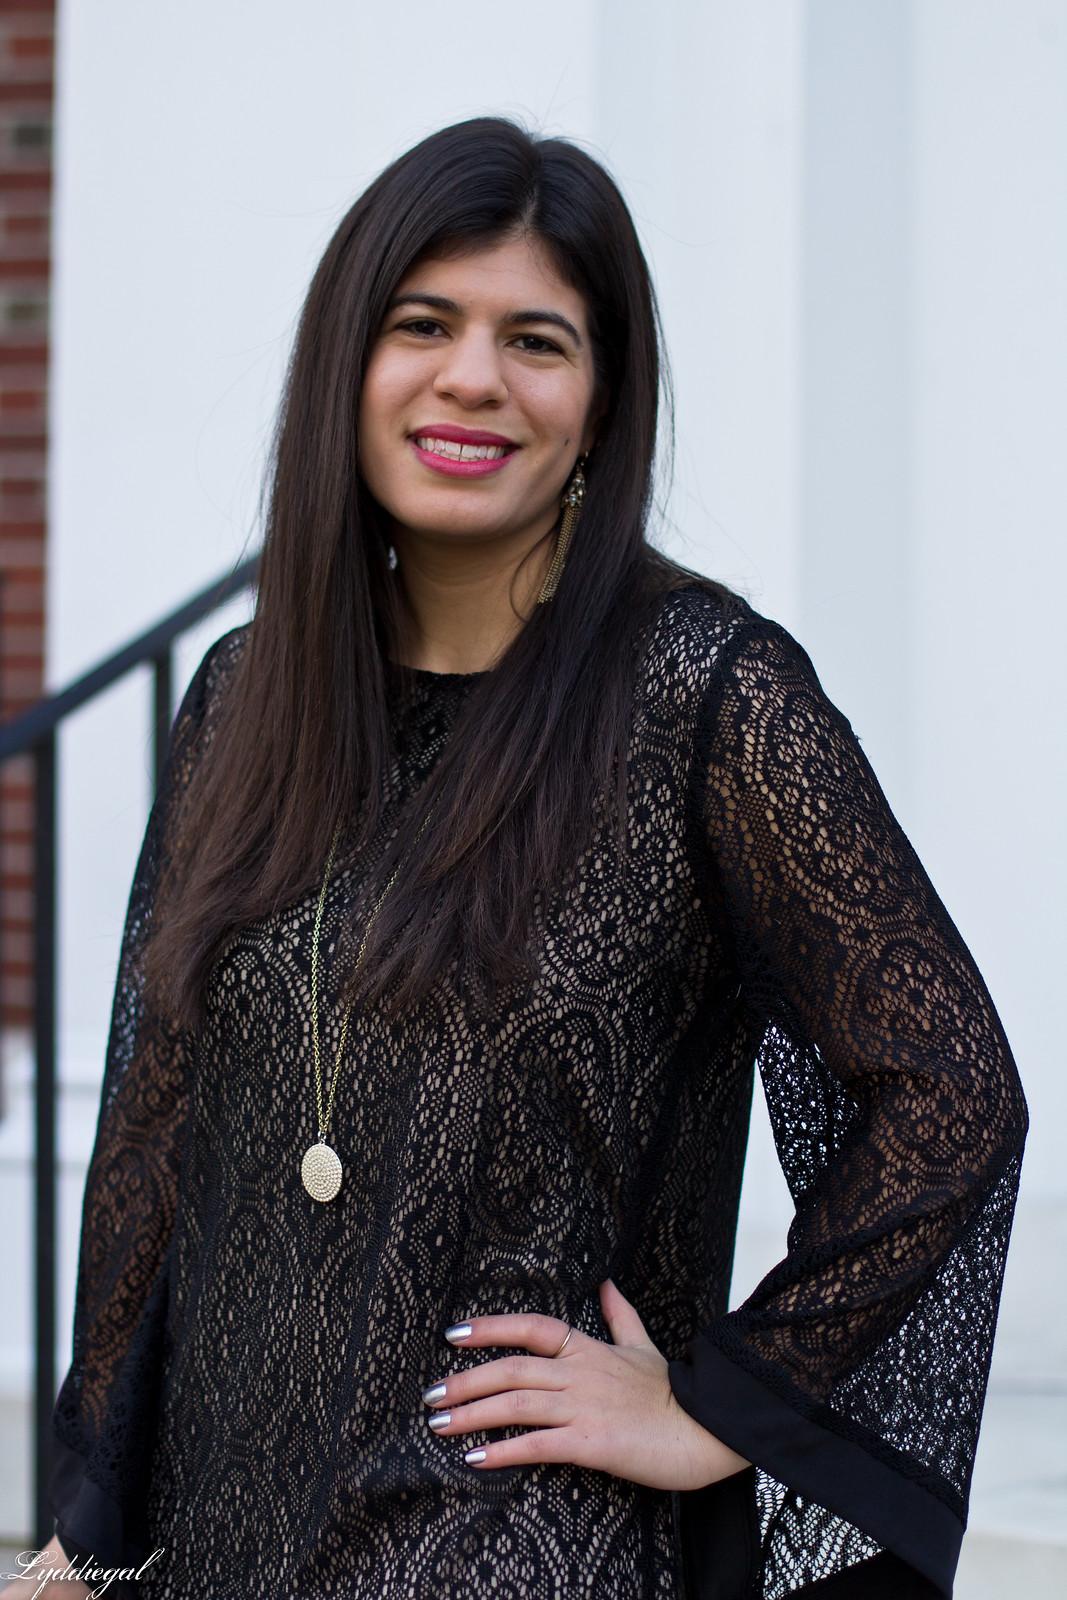 black lace dress, gold sequin clutch, studded pumps-5.jpg